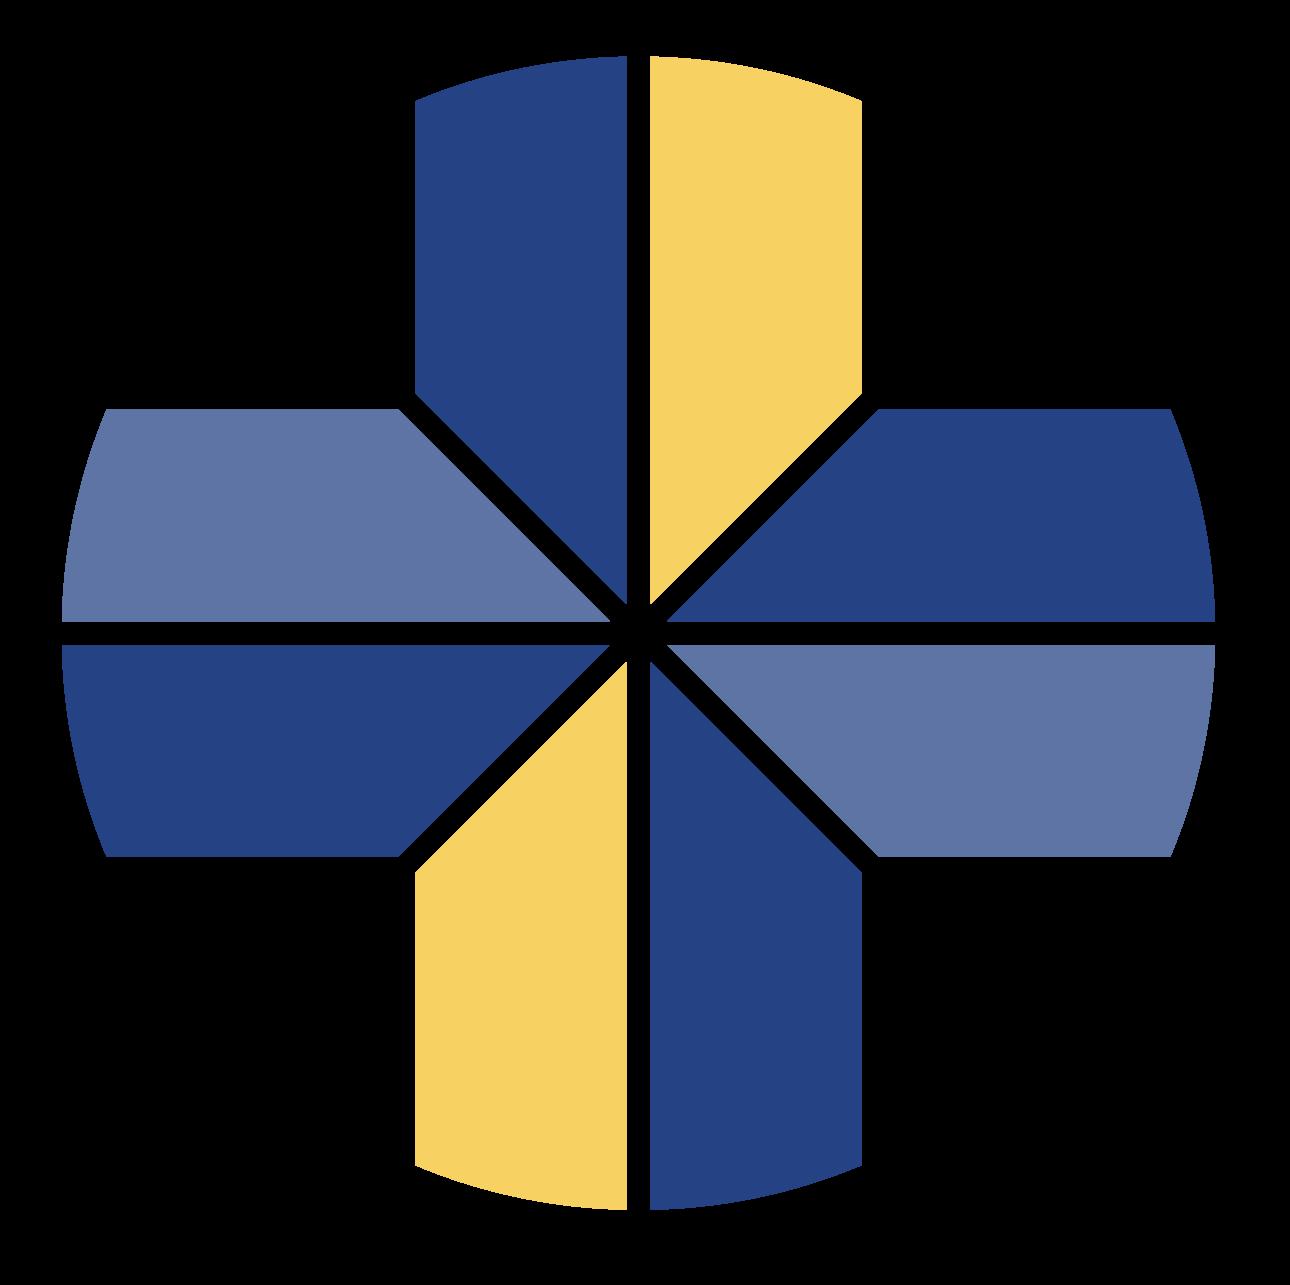 MostHolyRedeemerCatholicSchool_Logo-HORIZ-COLOR_Final_1-19-2020 (1)